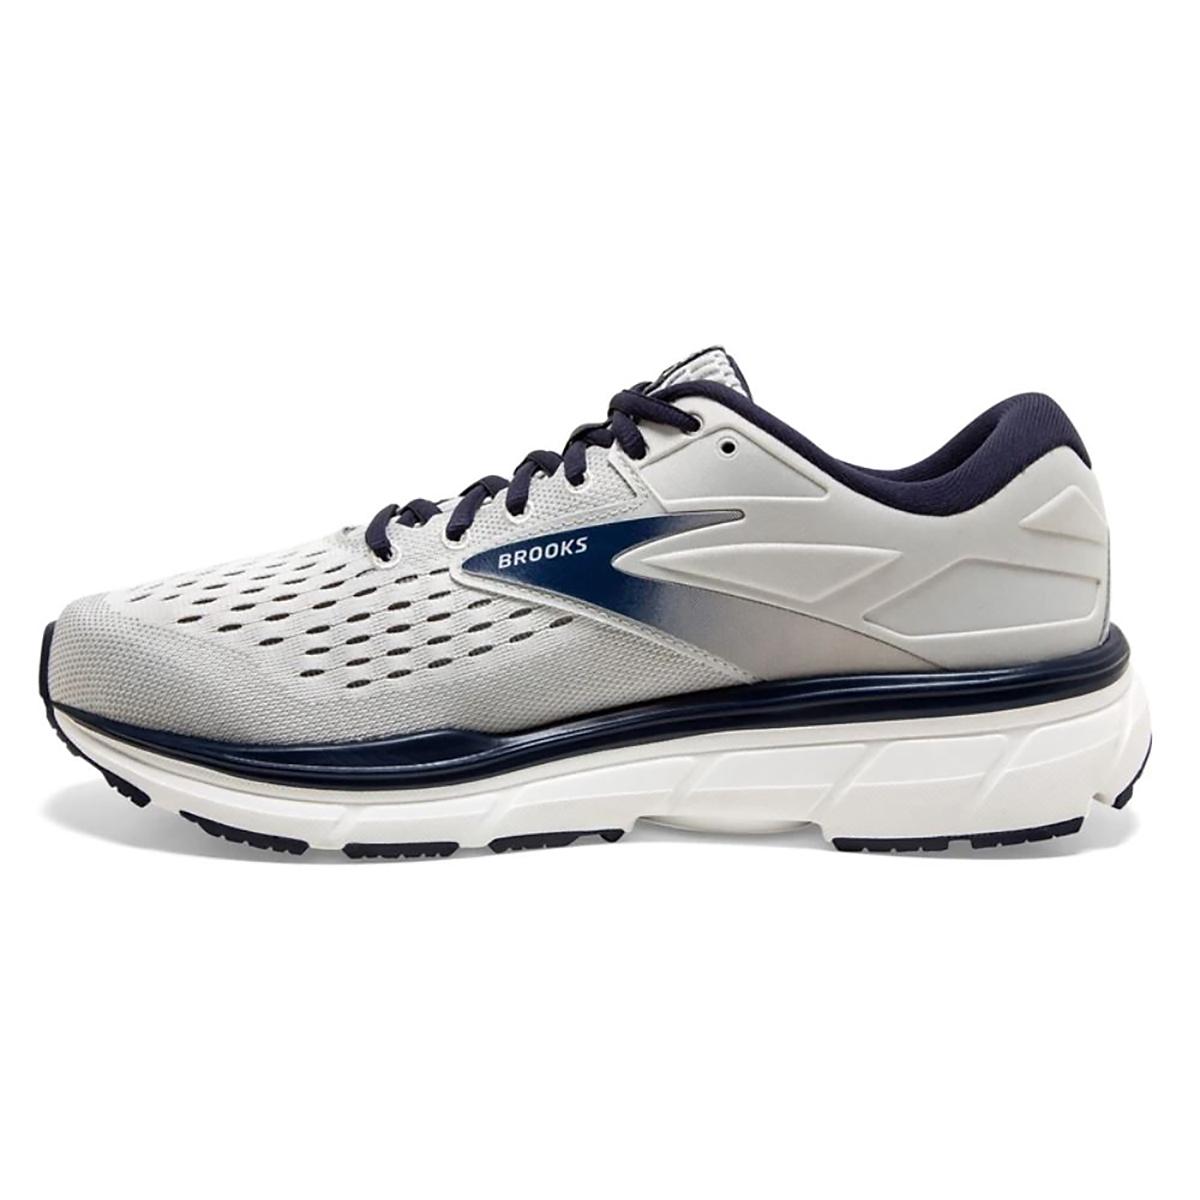 Men's Brooks Dyad 11 Running Shoe - Color: Antarctica/Grey/Peacoat (Regular Width) - Size: 7, Antarctica/Grey/Peacoat, large, image 2